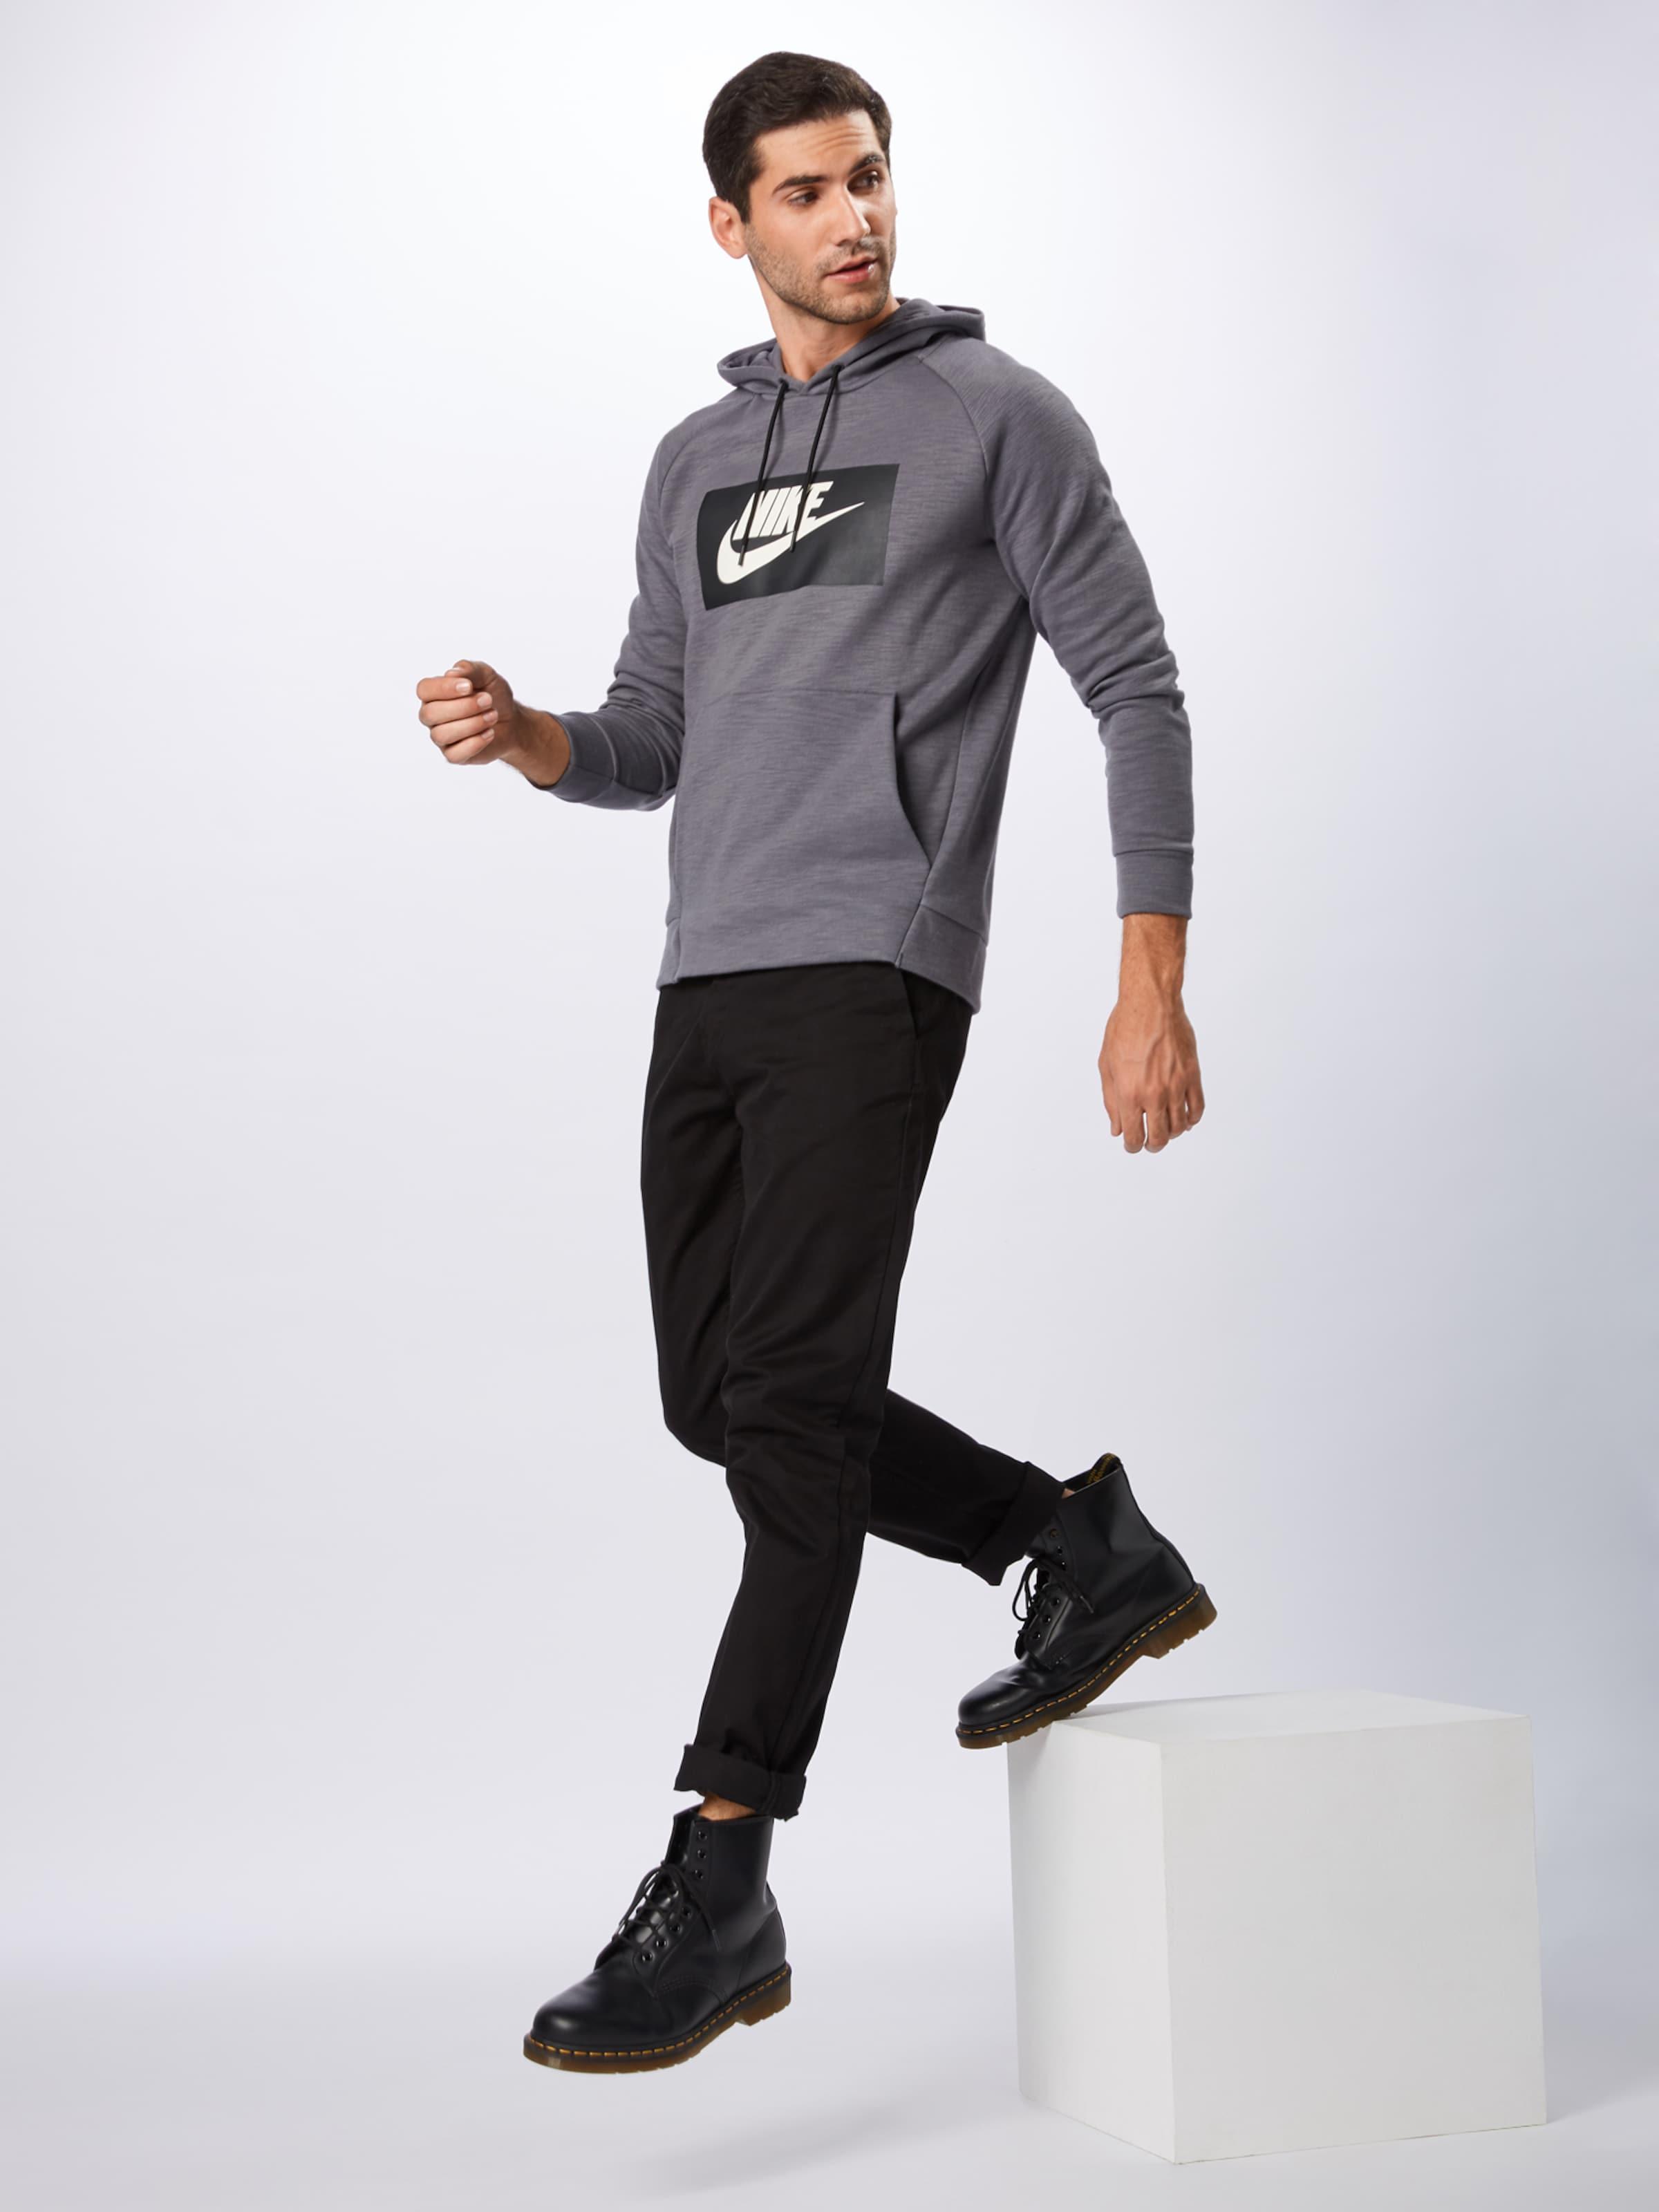 DunkelgrauSchwarz In 'optic' Weiß Sweatshirt Sportswear Nike SpqVzUM